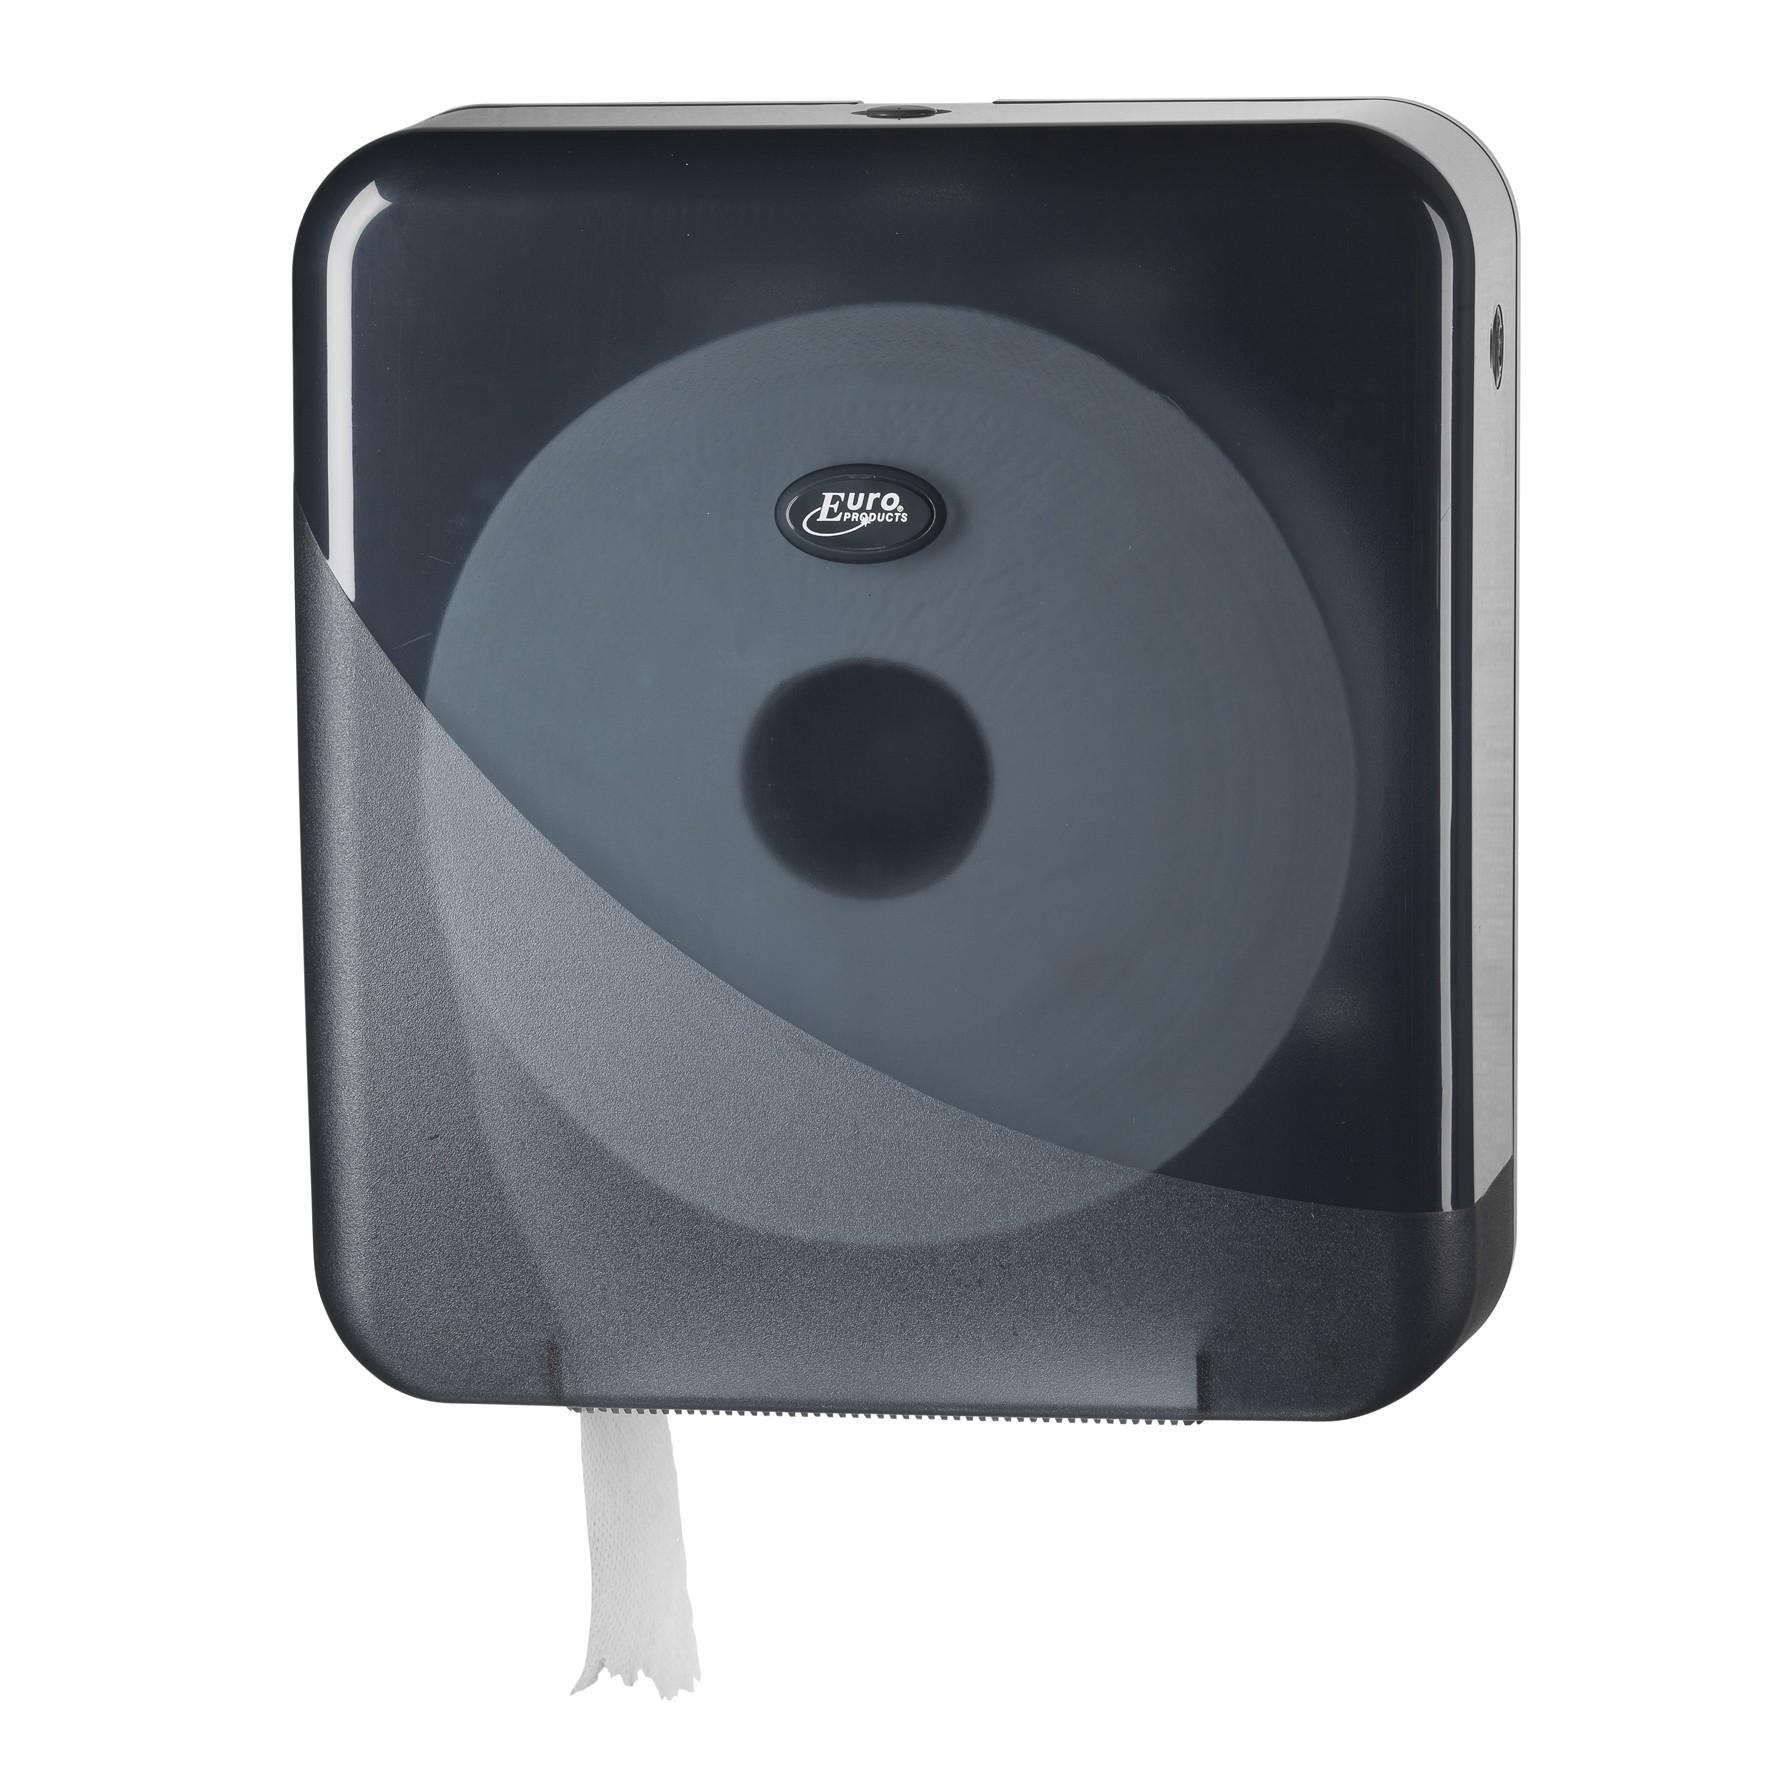 Pearl BLACK maxi jumbo toiletrol houder